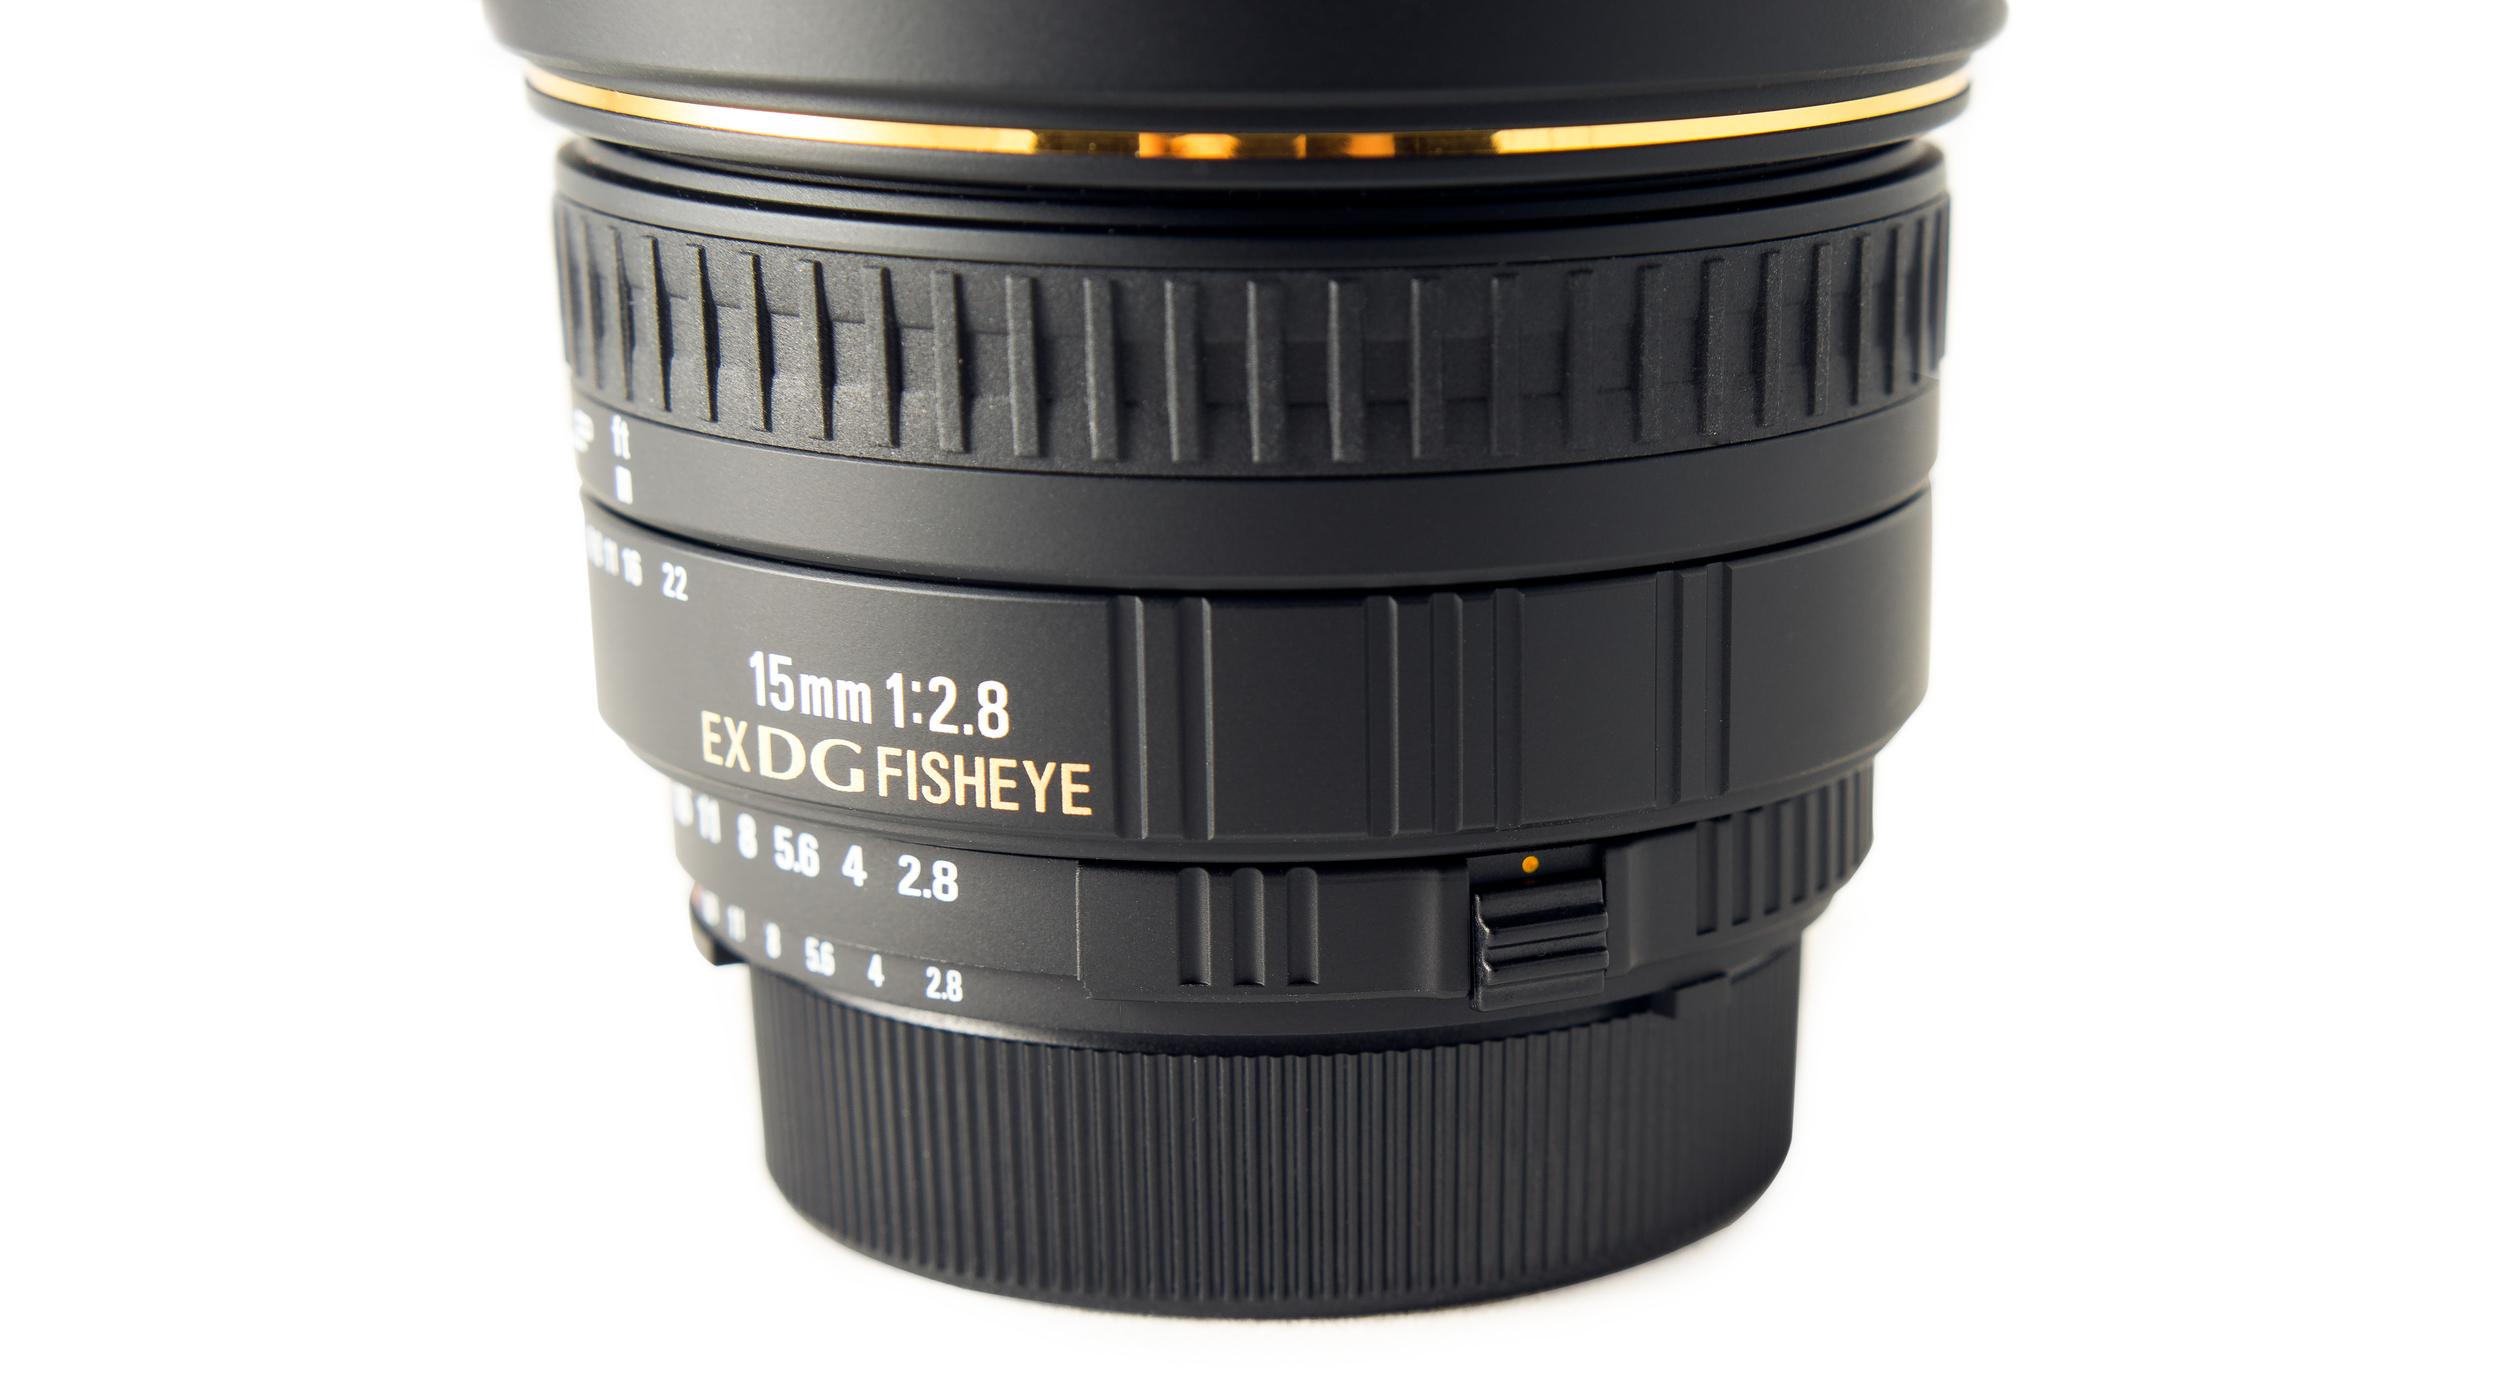 Drew Steven Photography Sigma 15 Fisheye Review